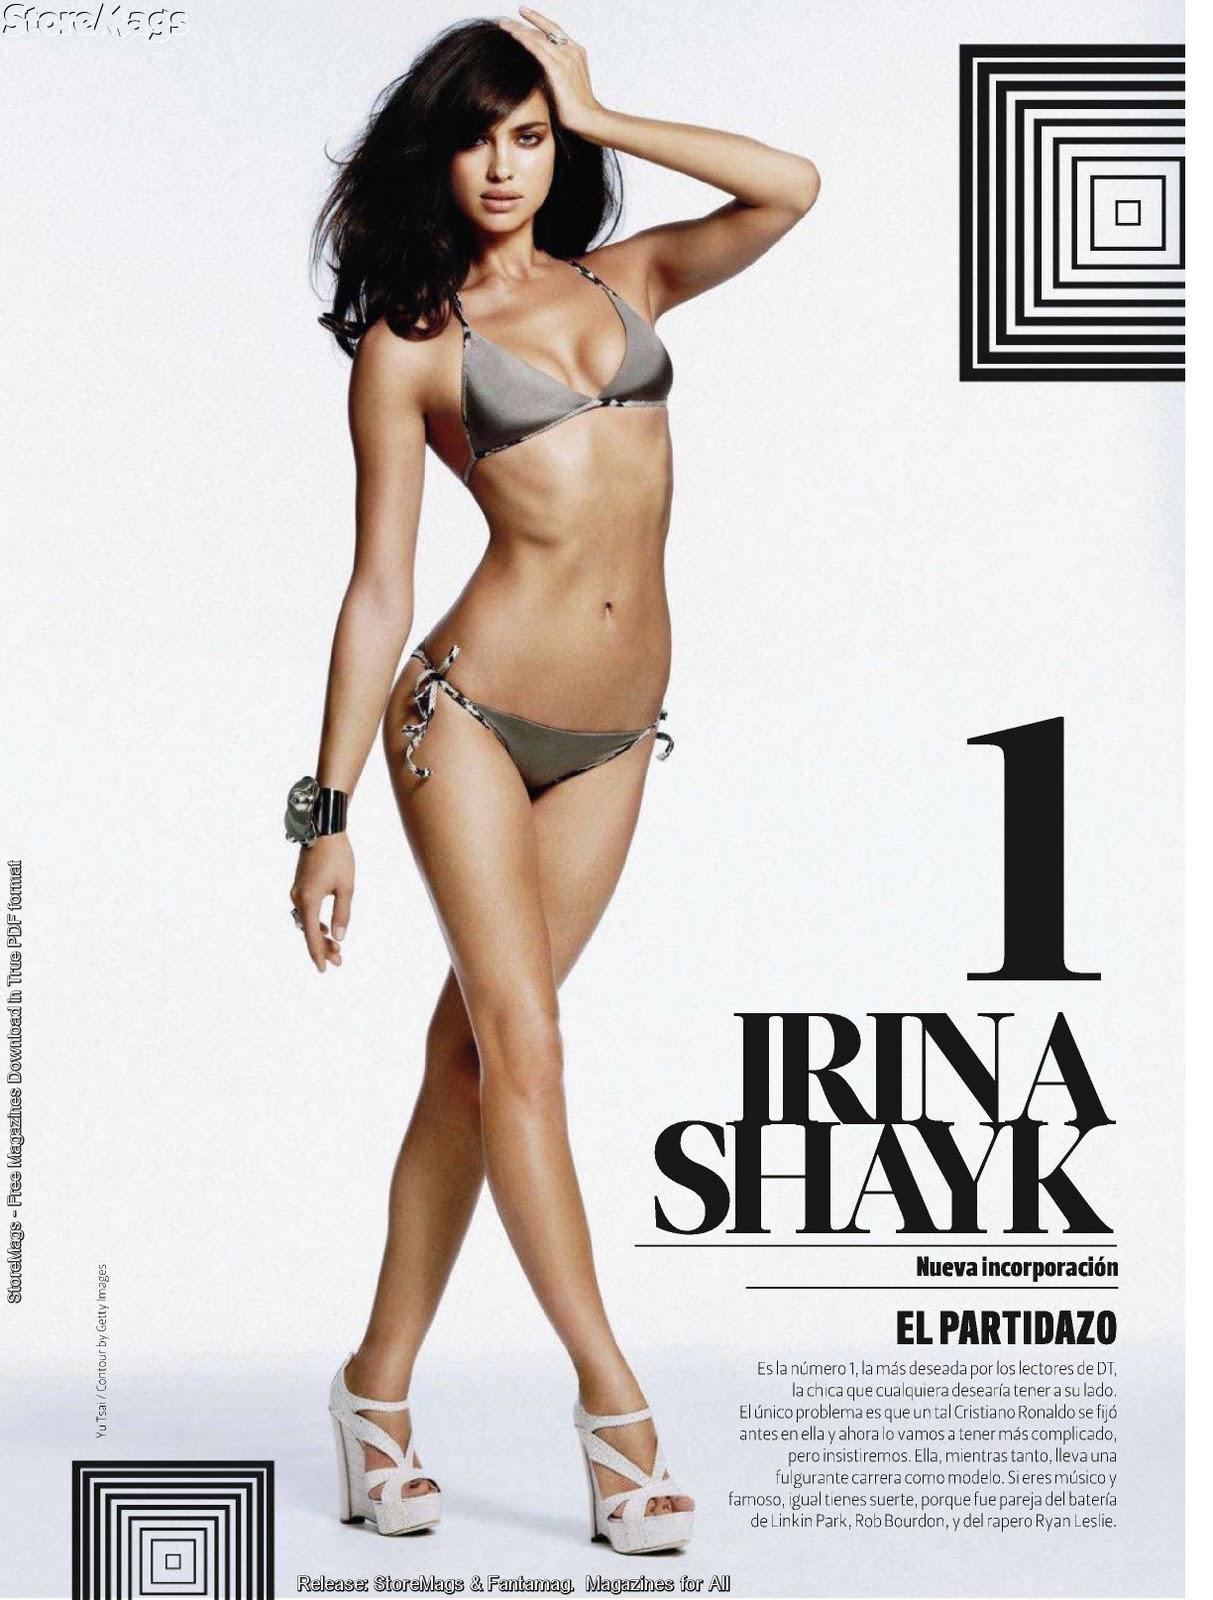 http://1.bp.blogspot.com/_kDujDzwdR0M/TUTee4H_lzI/AAAAAAAAF10/Amhb9JO10N4/s1600/Irina+Shayk+%2528DT+Magazine+Feb+2011+%25282%2529.jpg